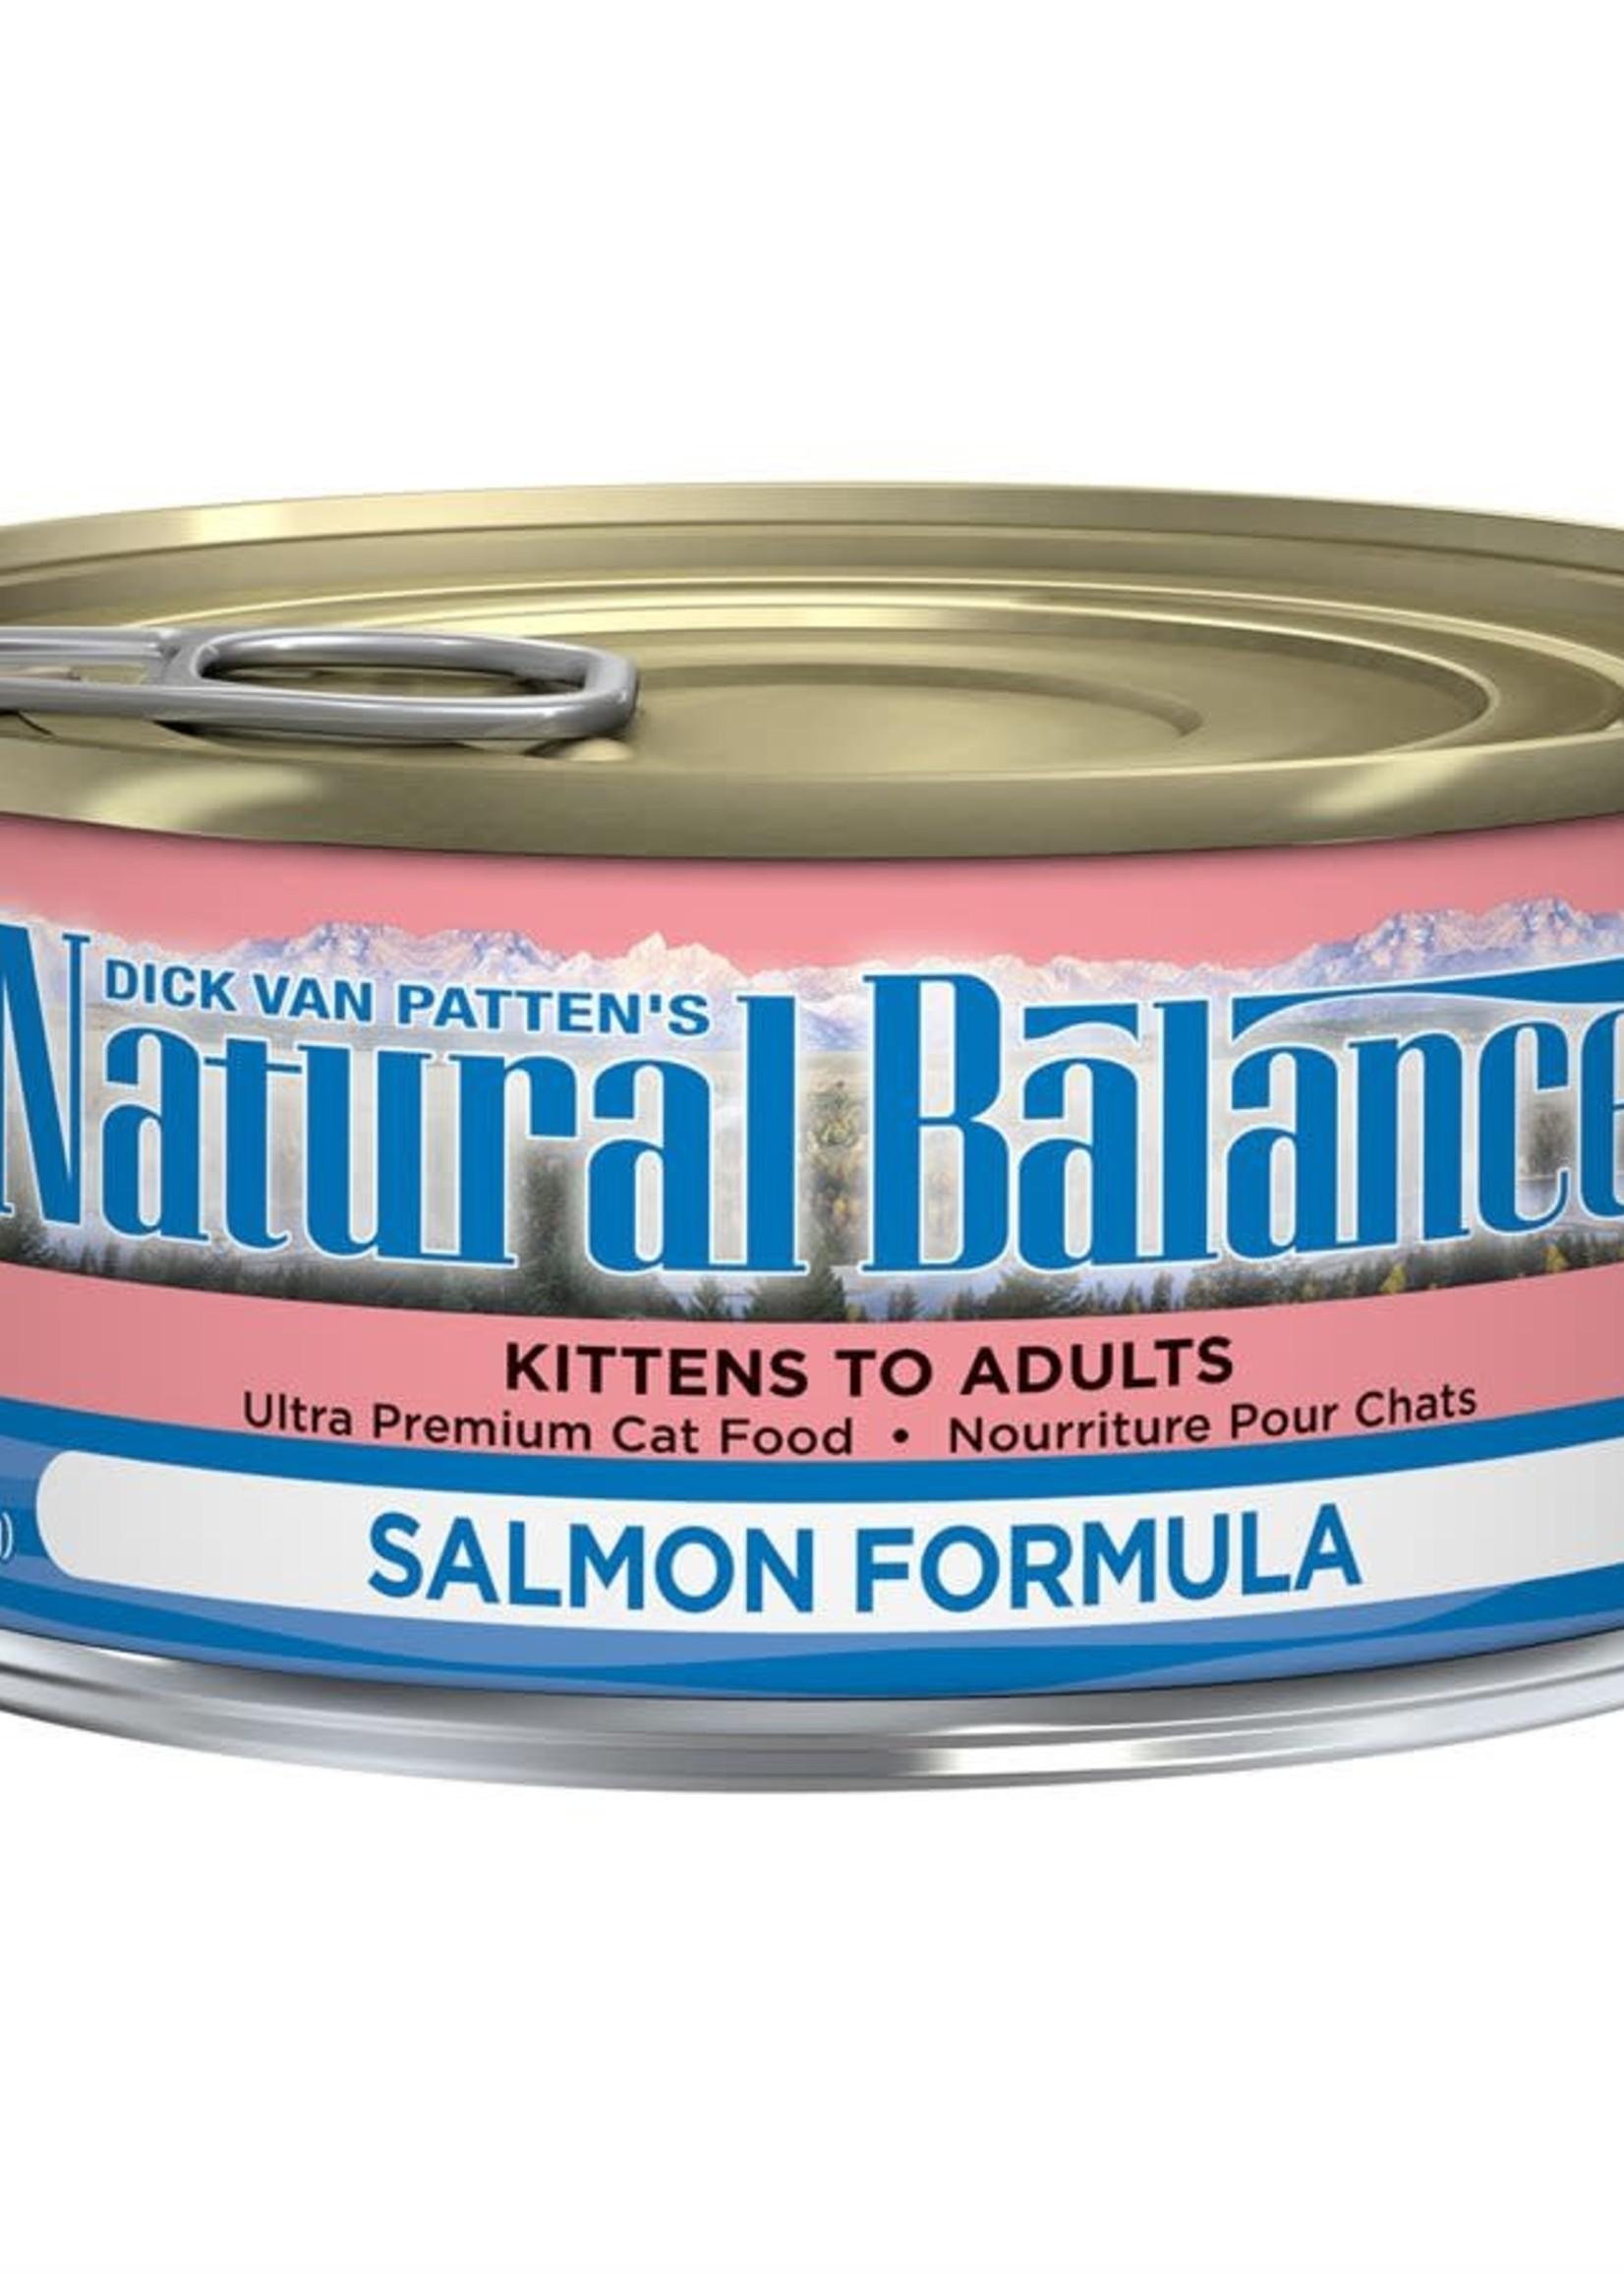 Natural Balance® NATURAL BALANCE SALMON FORMULA 5.5oz